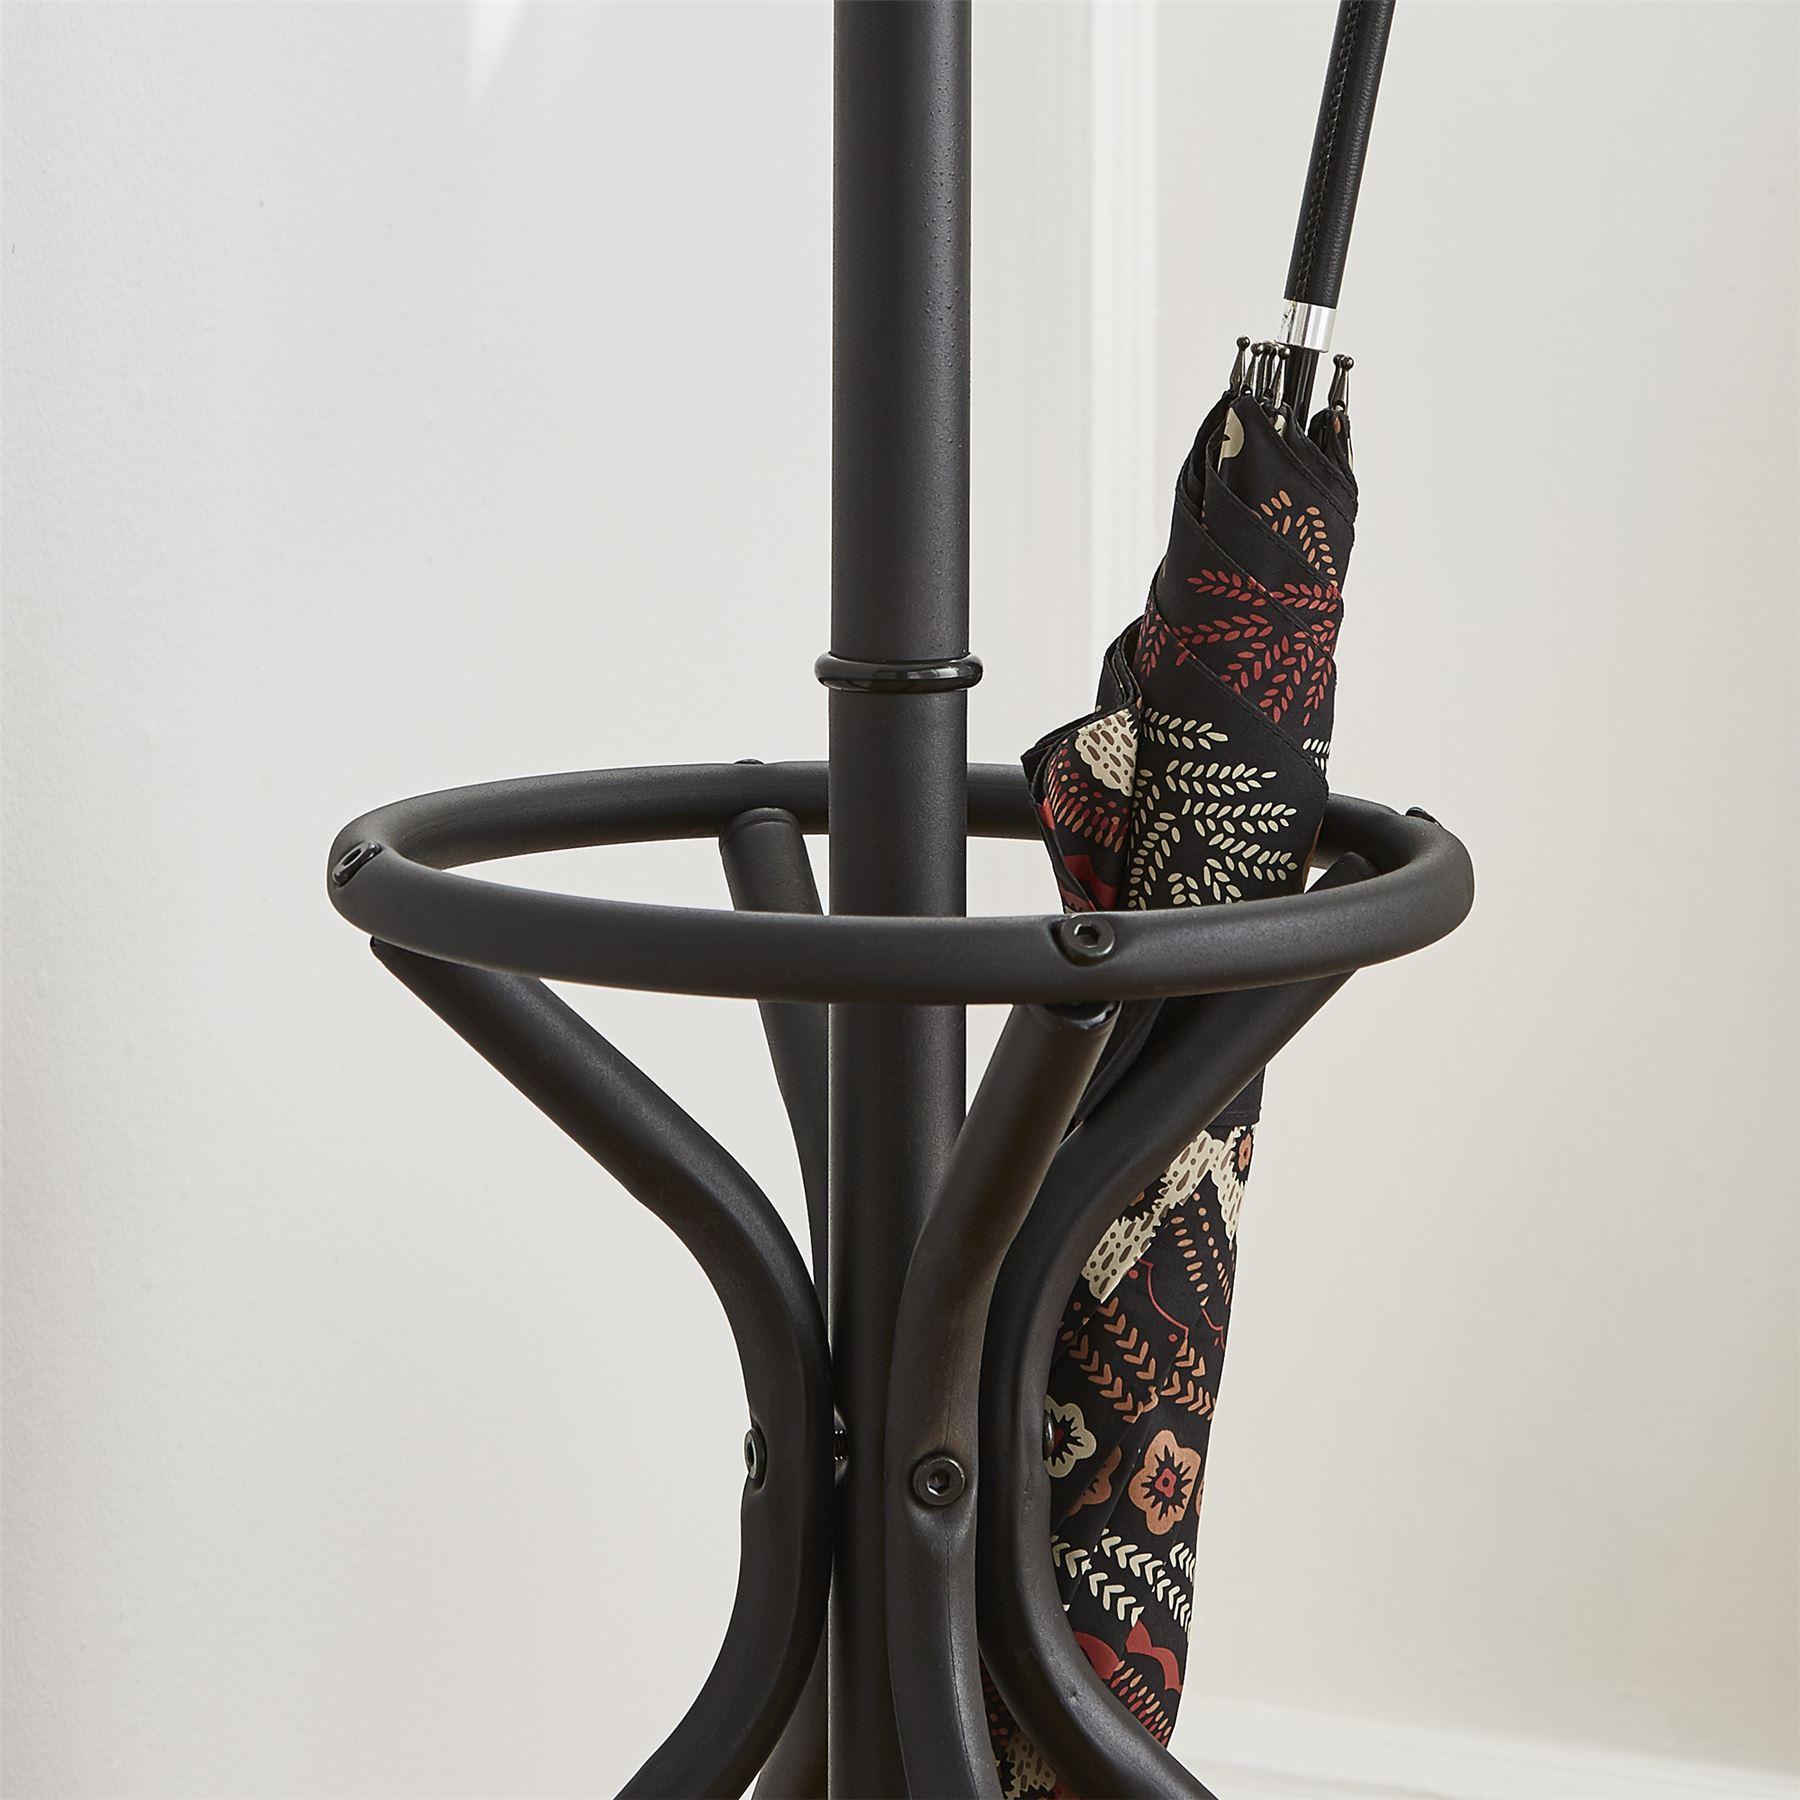 Umbrella Stand Definition: Vintage Style Black Metal Hat Coat Stand Umbrella Hook